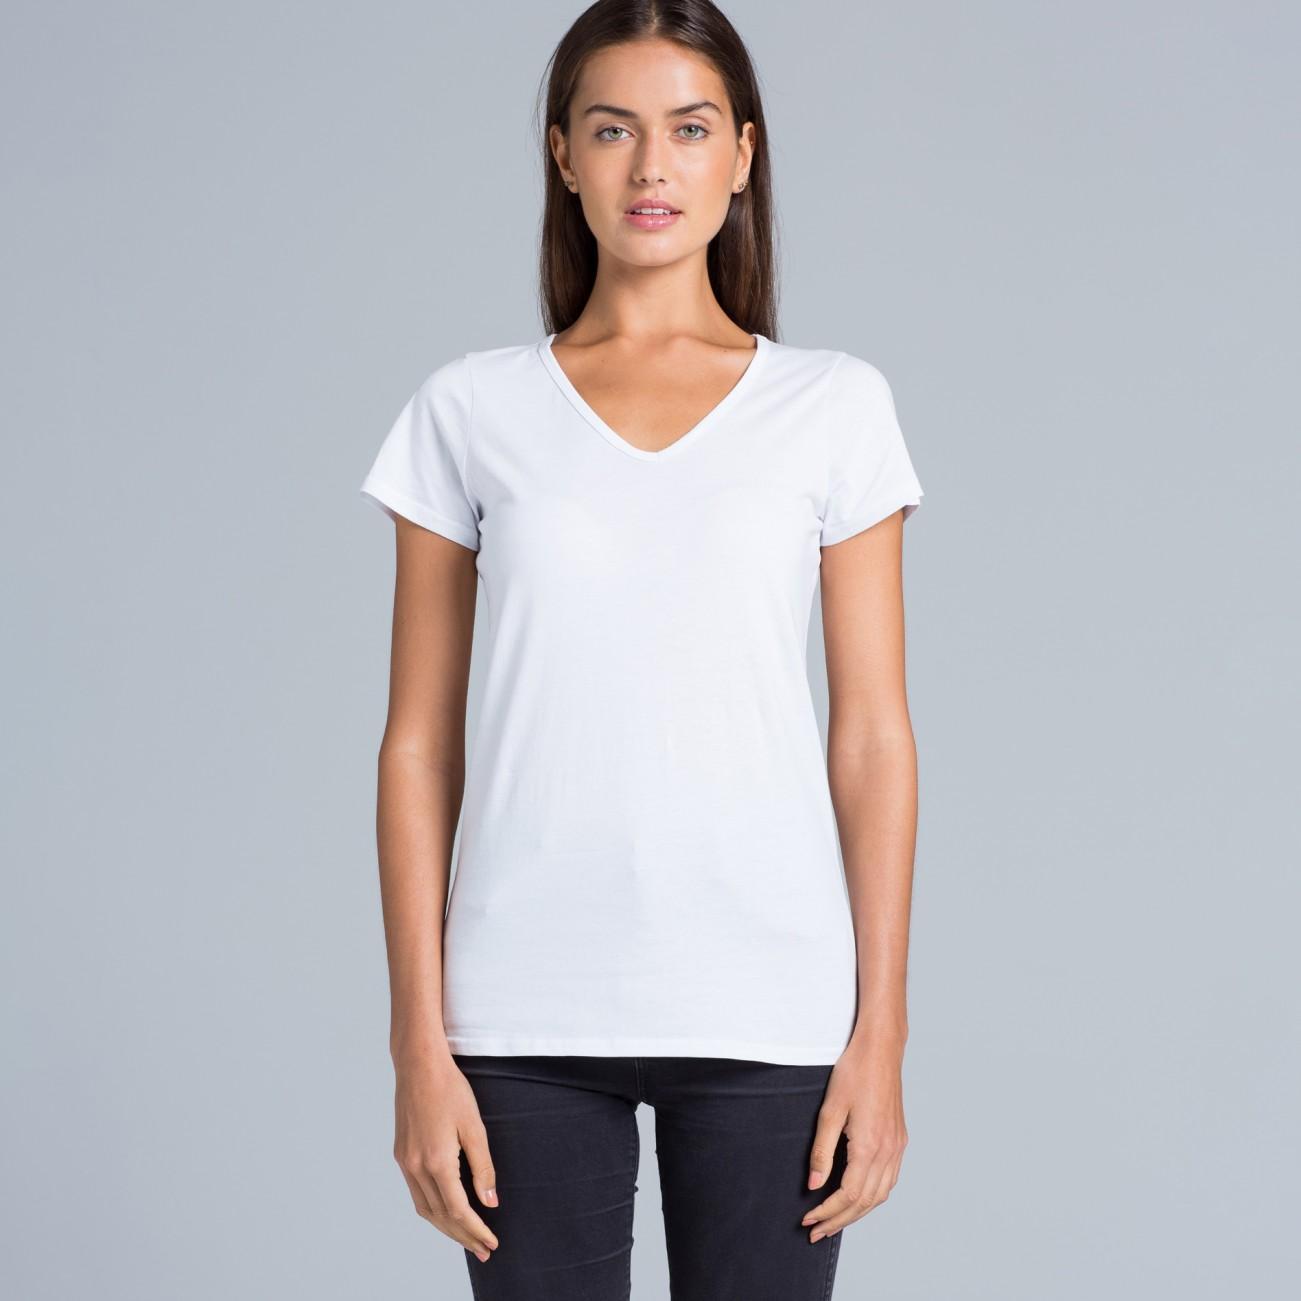 Womens bevel v neck tee cotton blend t shirts the for V neck shirt for women